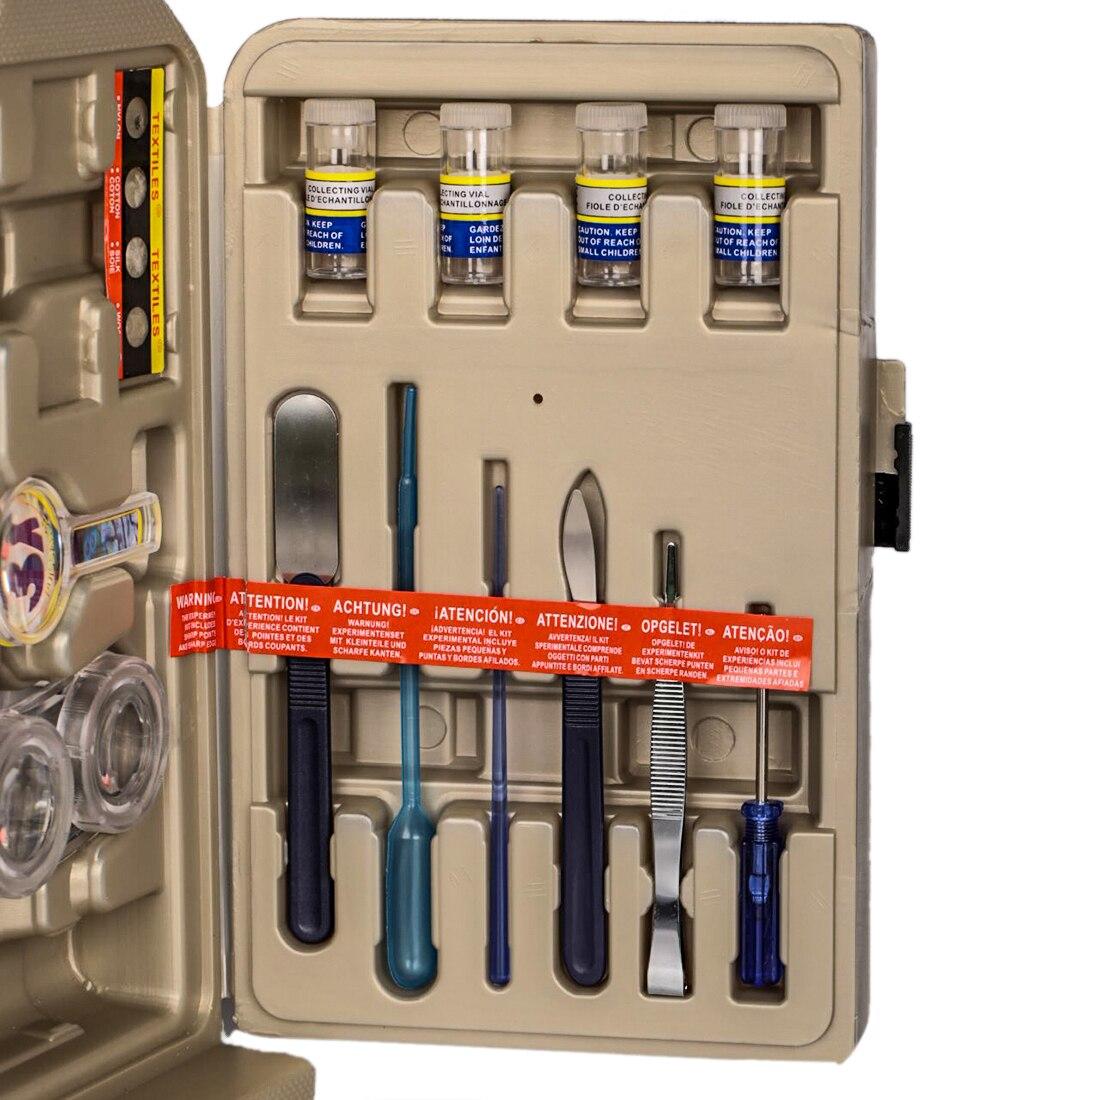 DIY 100X 200X 300X 600X 1200X Hd gran angular microscopio óptico puzle análisis celular equipo Experimental Stem Toy para niños - 4